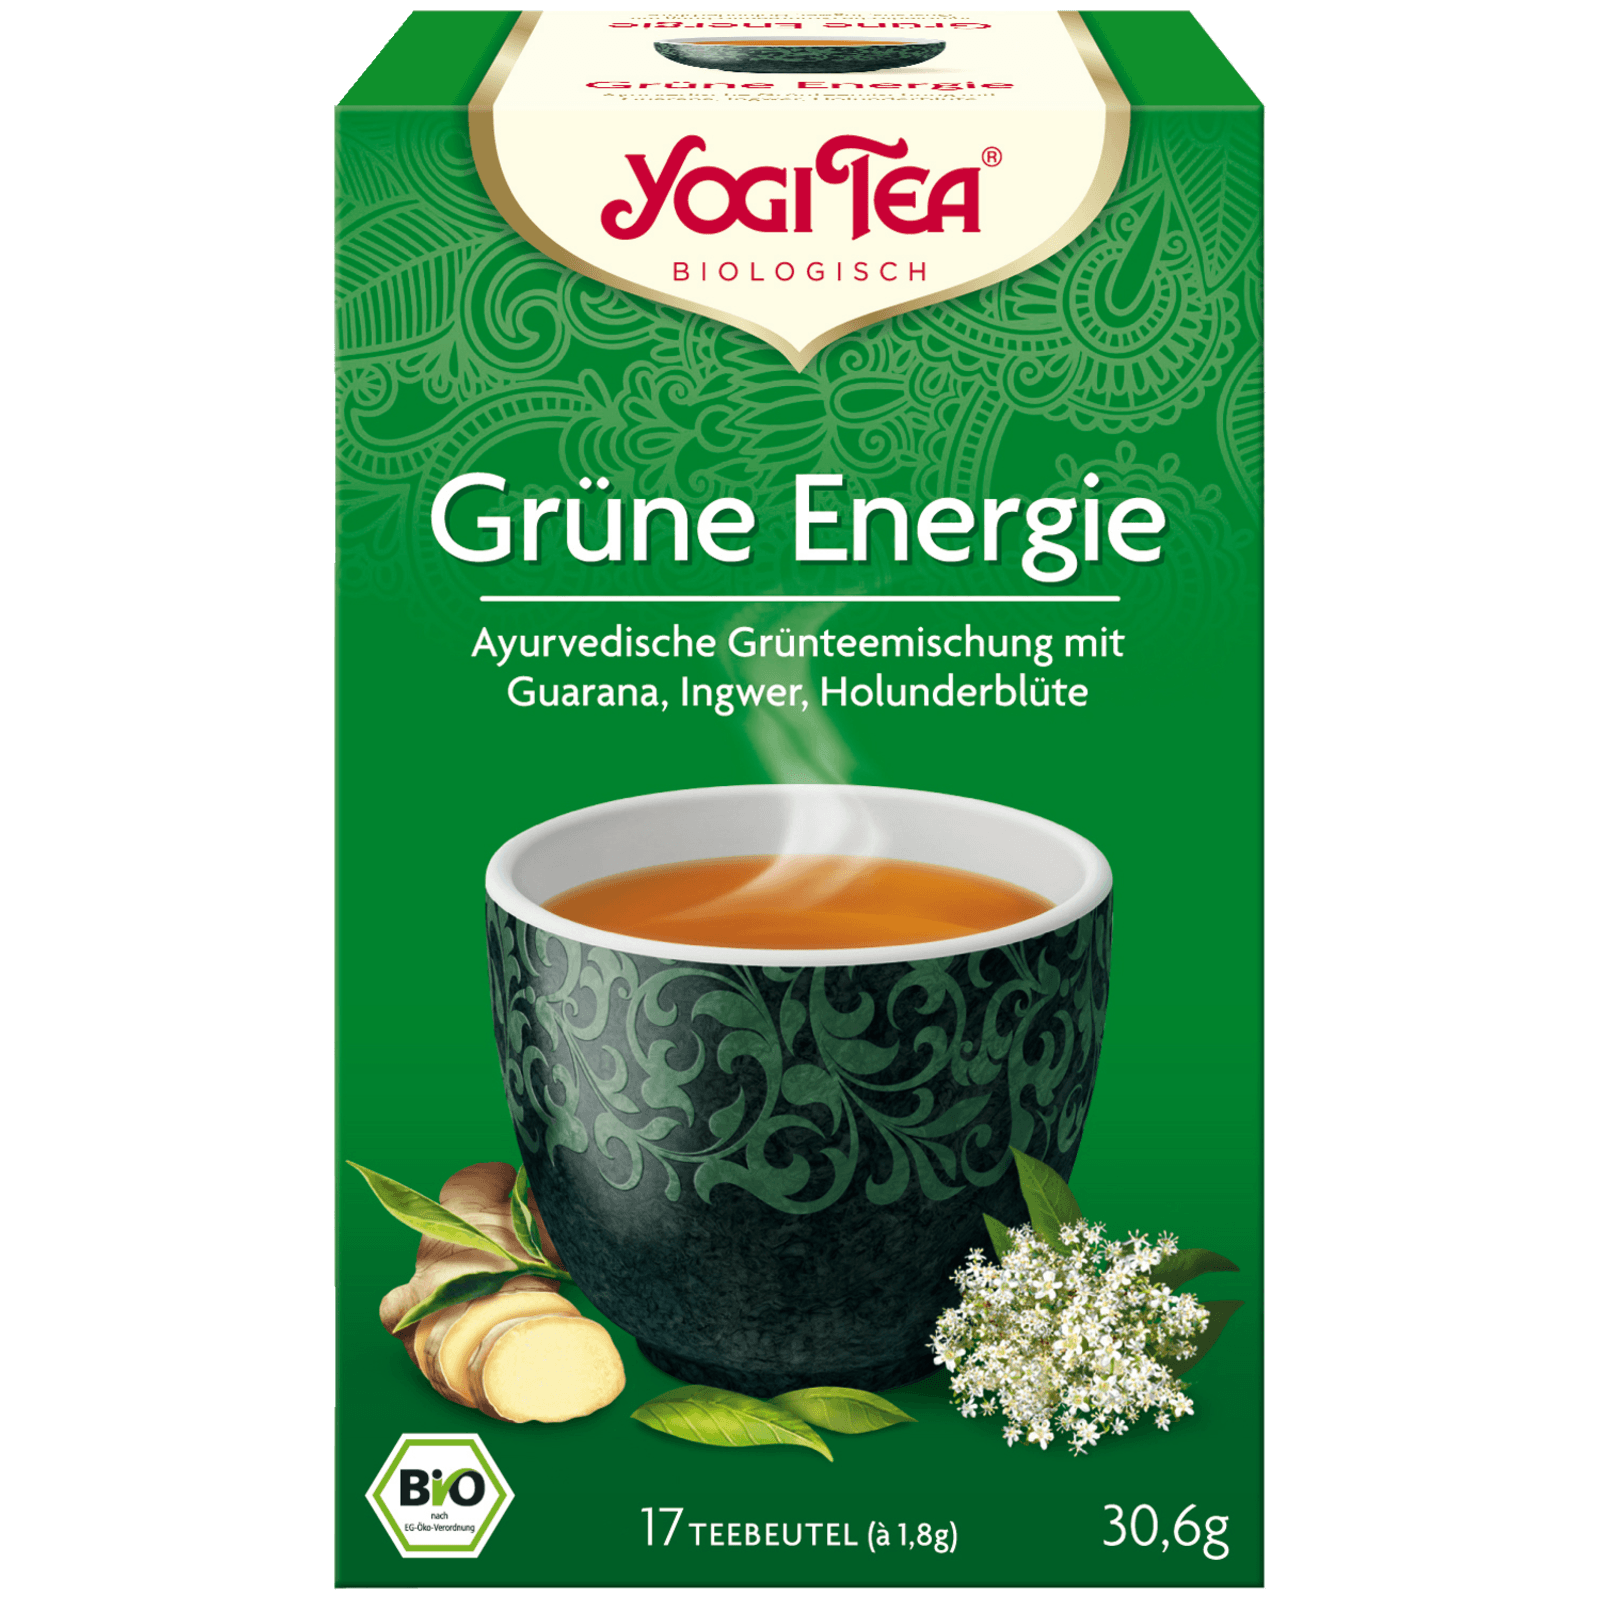 Yogi Tea Grüne Energie Bio 30,6g, 17 Beutel